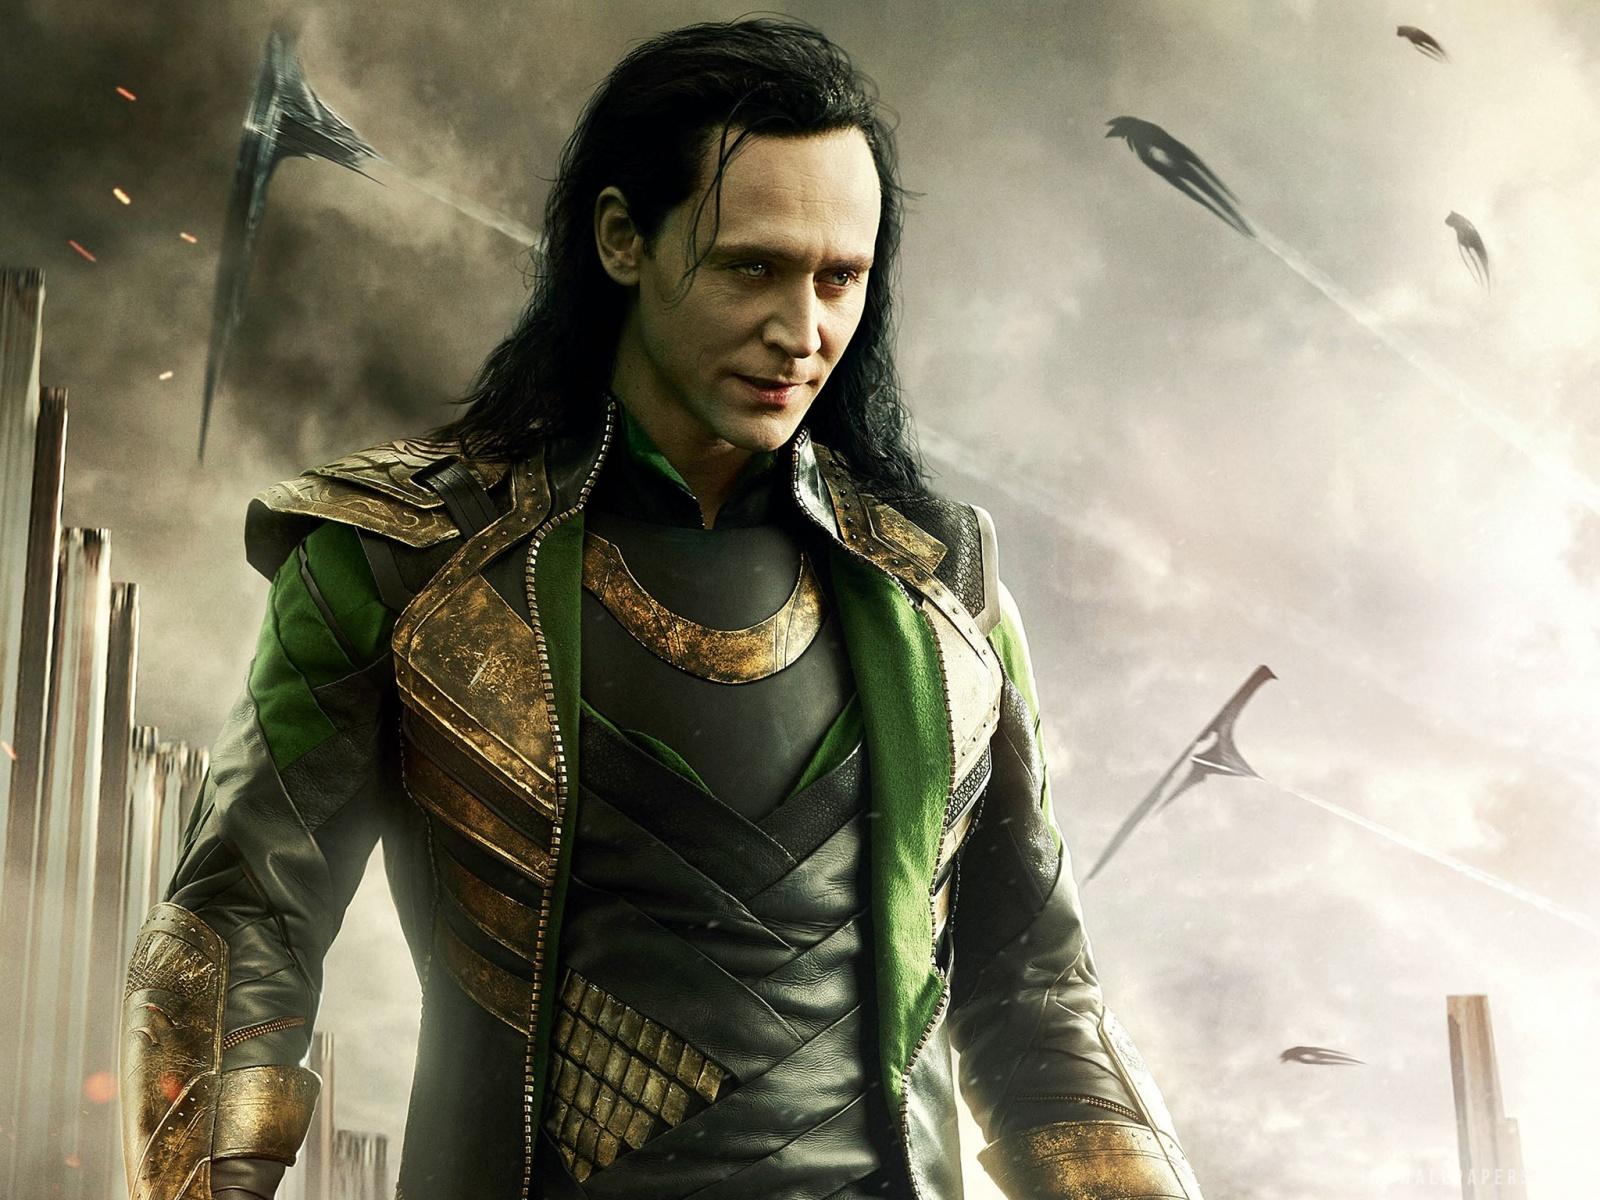 Loki Thor 2 The Dark World HD Wallpaper   iHD Wallpapers 1600x1200